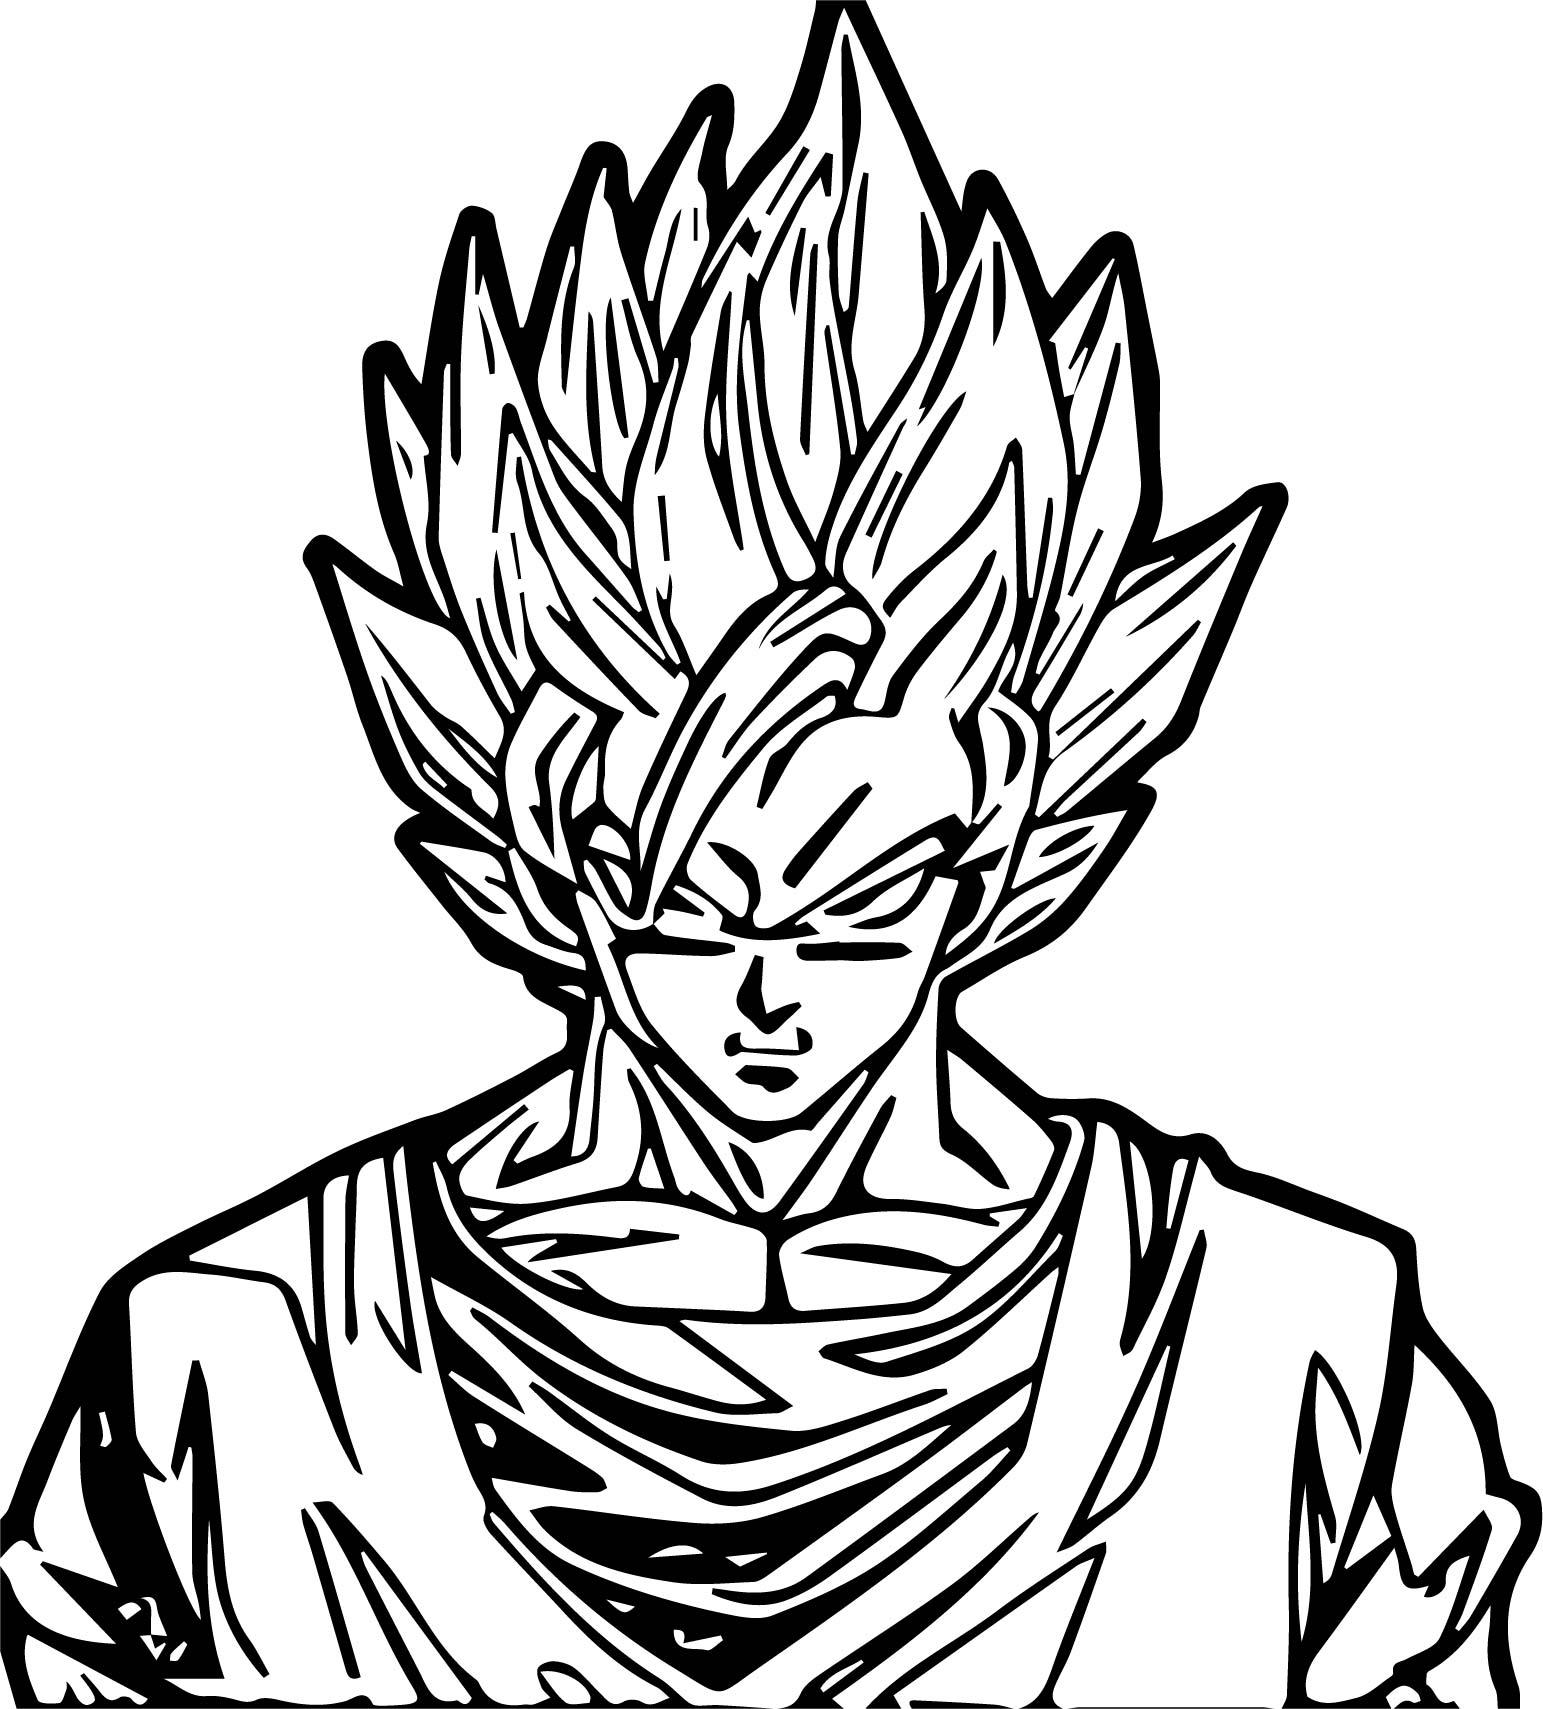 Goku We Coloring Page 047